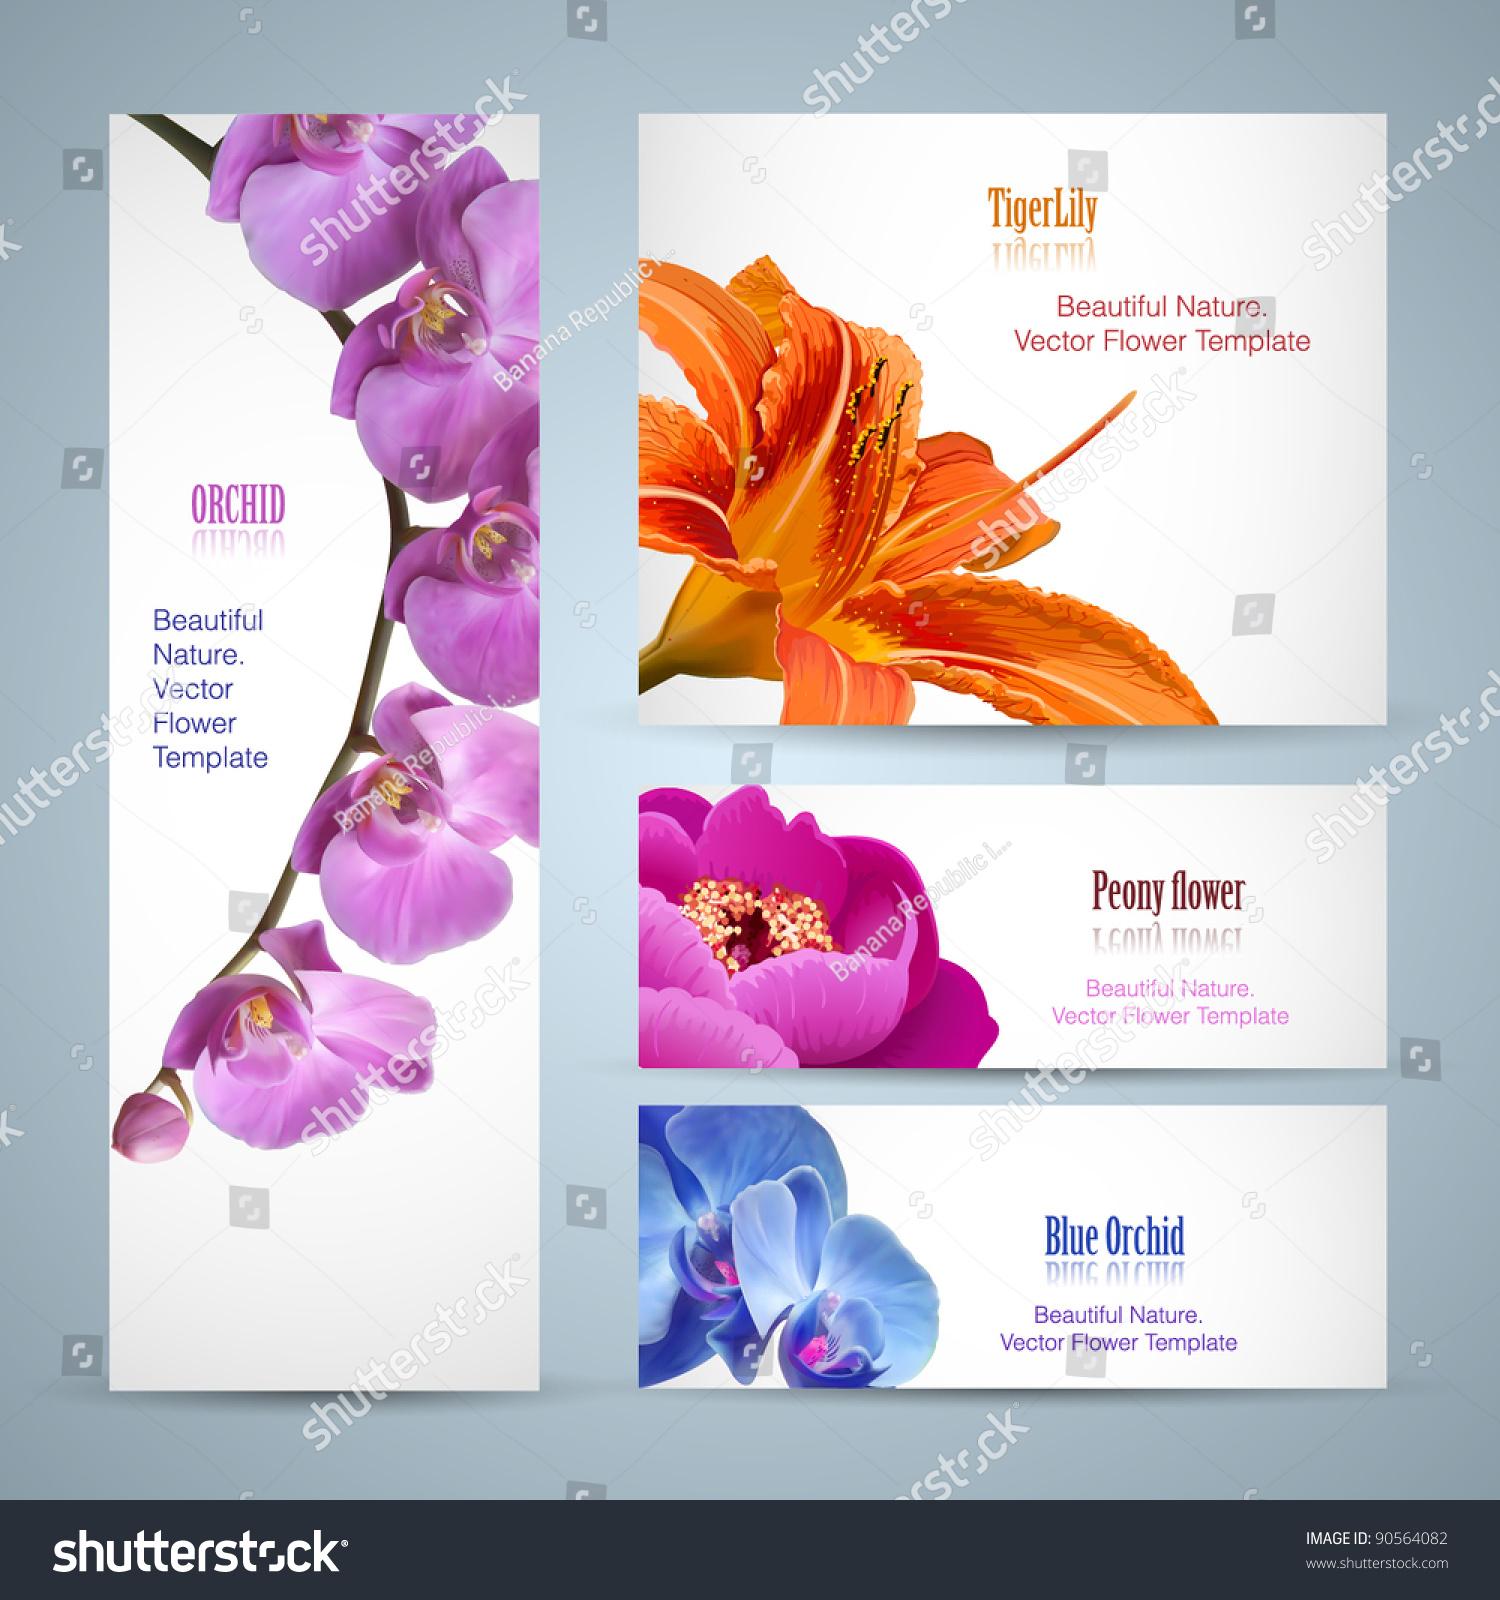 Flower Brochure Design Vector Layout Template Stock Vector